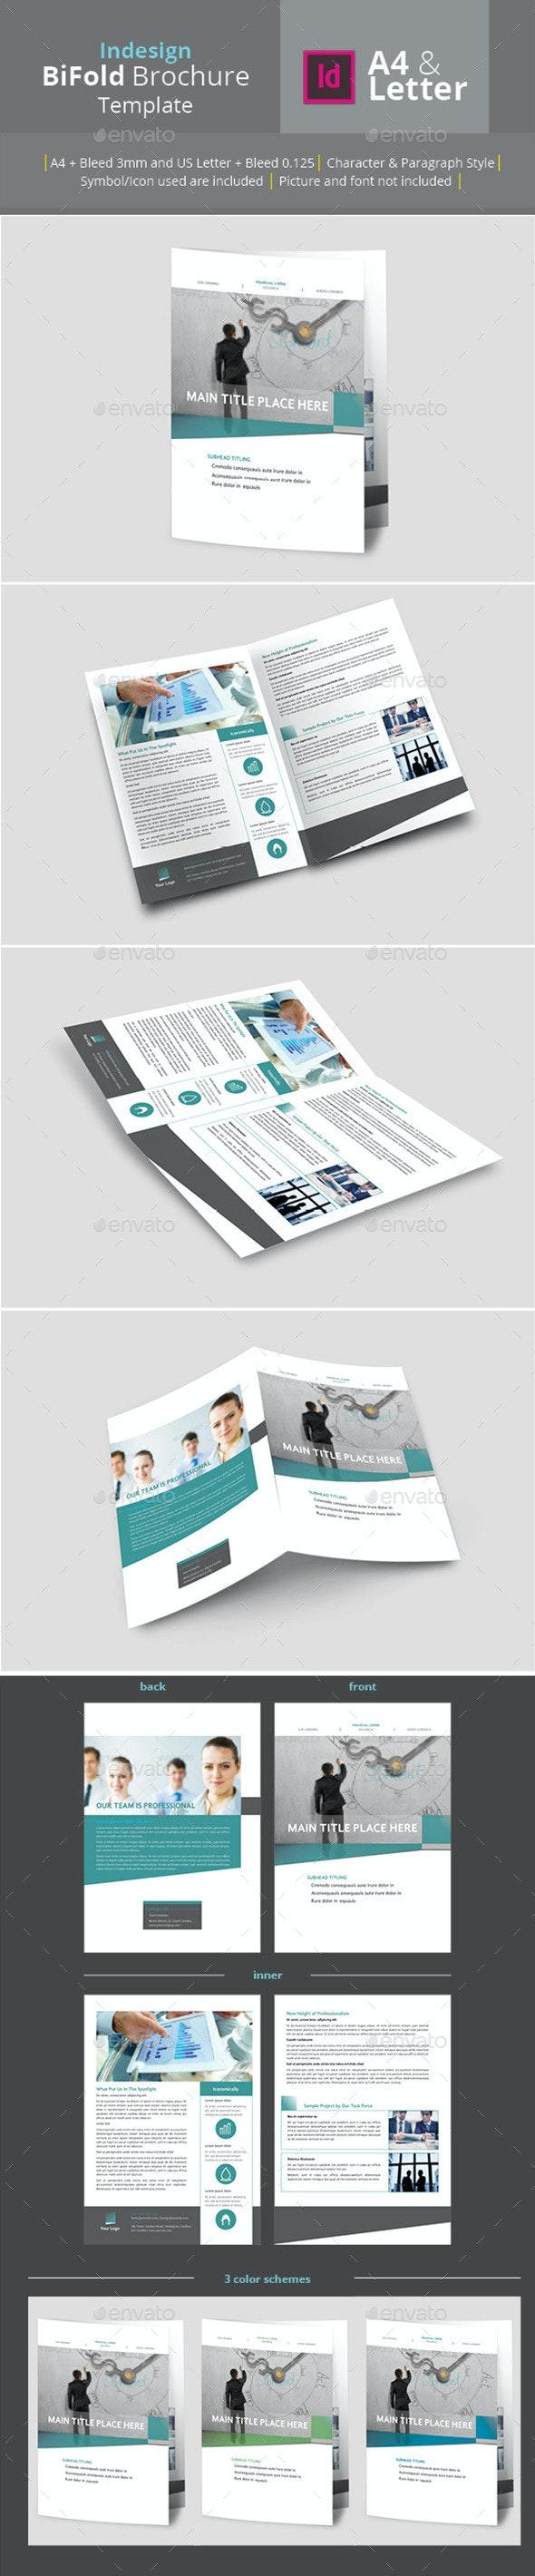 Bifold Brochure A4 & Letter Size - Brochures Print Templates